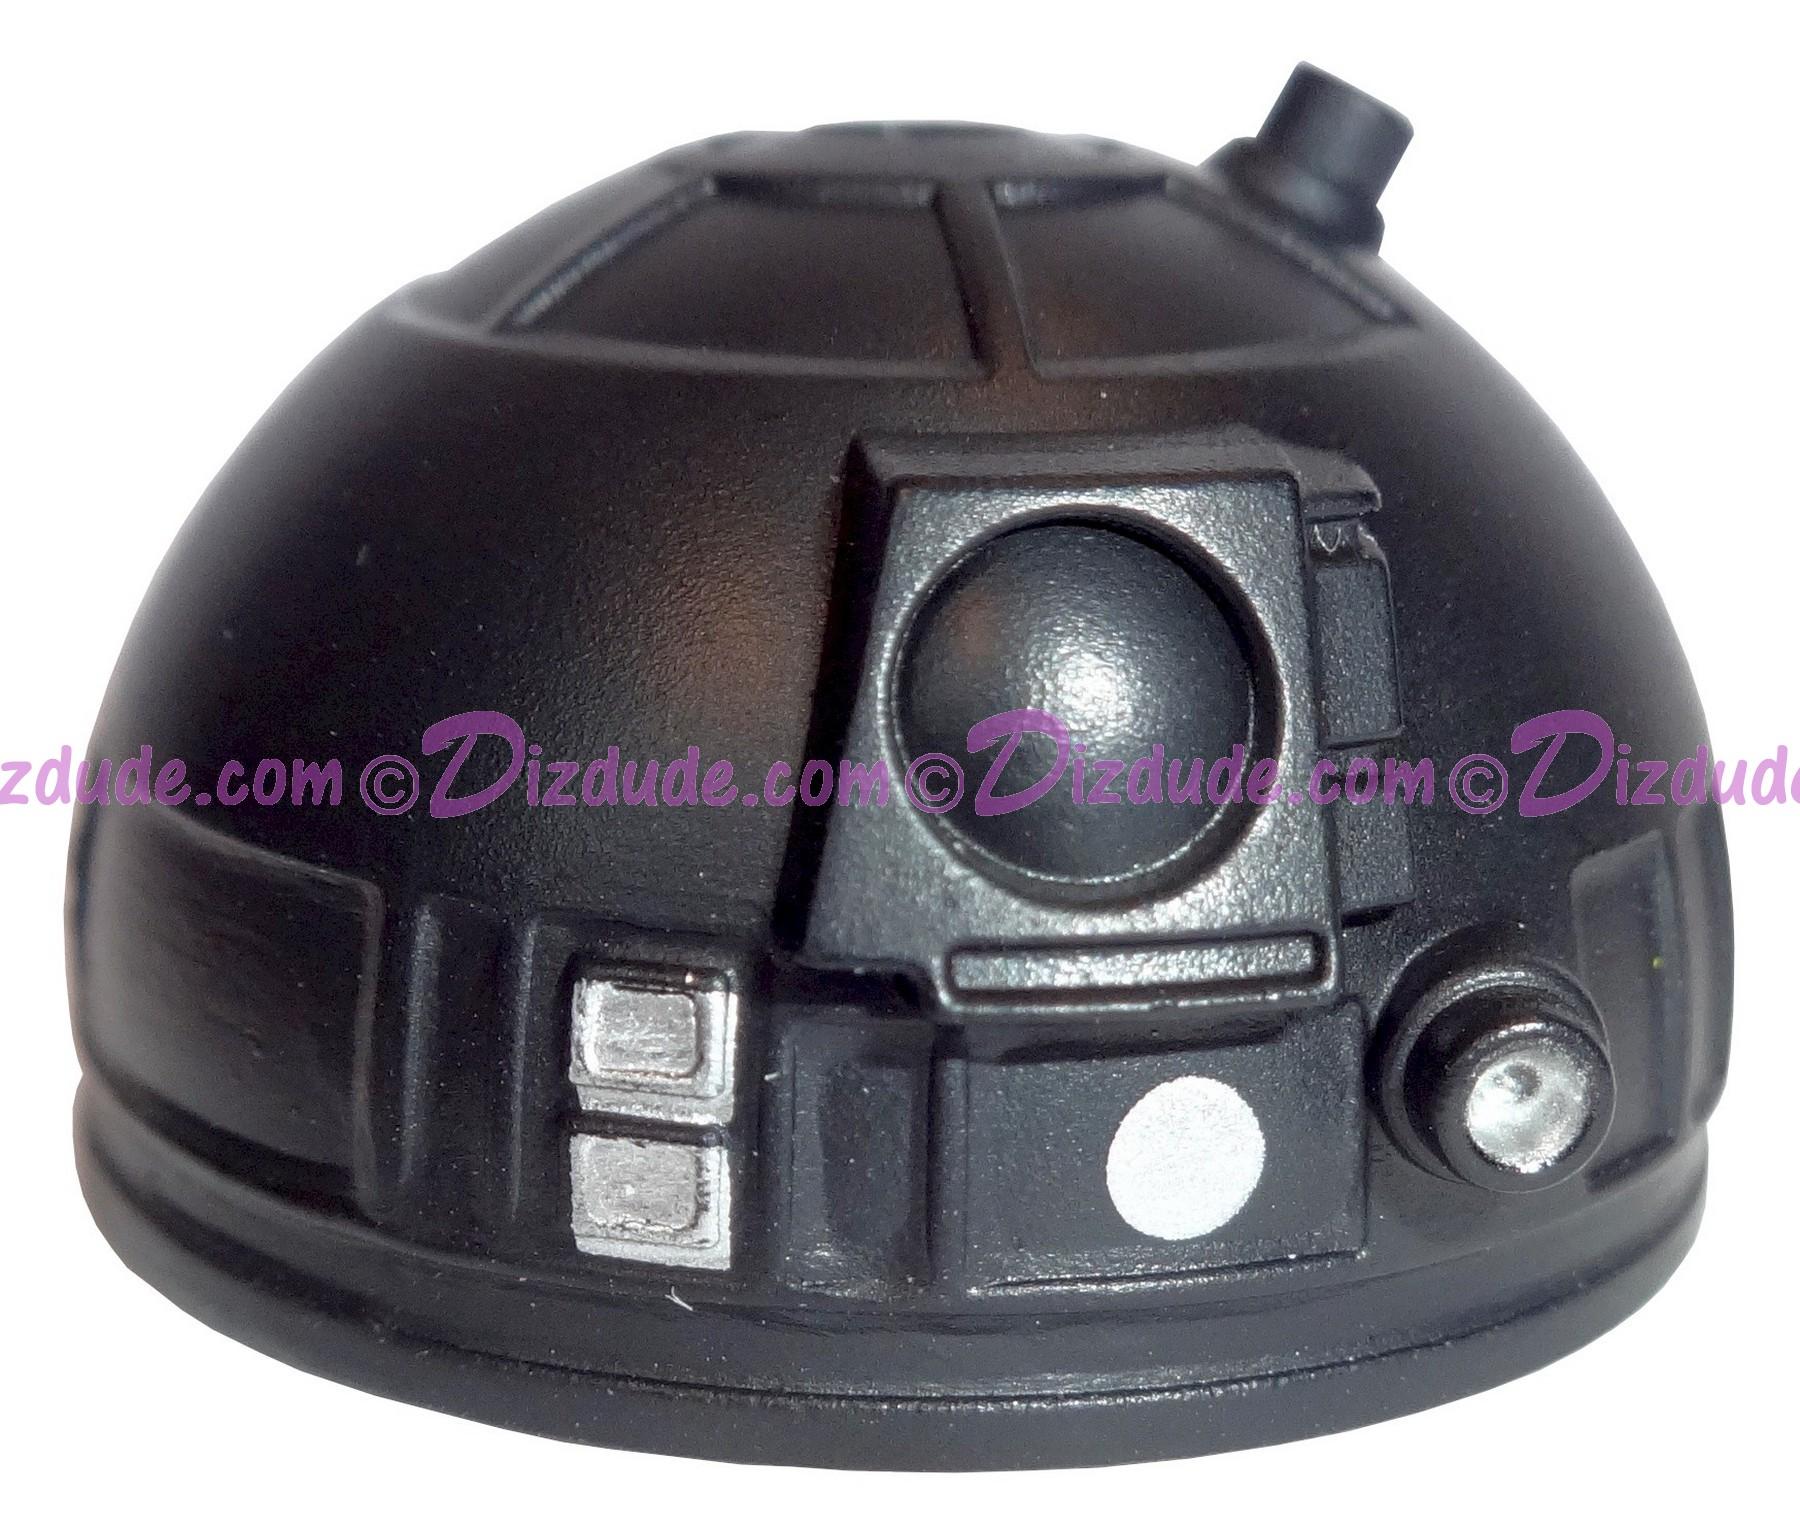 Black Astromech Droid Dome ~ Series 2 from Disney Star Wars Build-A-Droid Factory © Dizdude.com